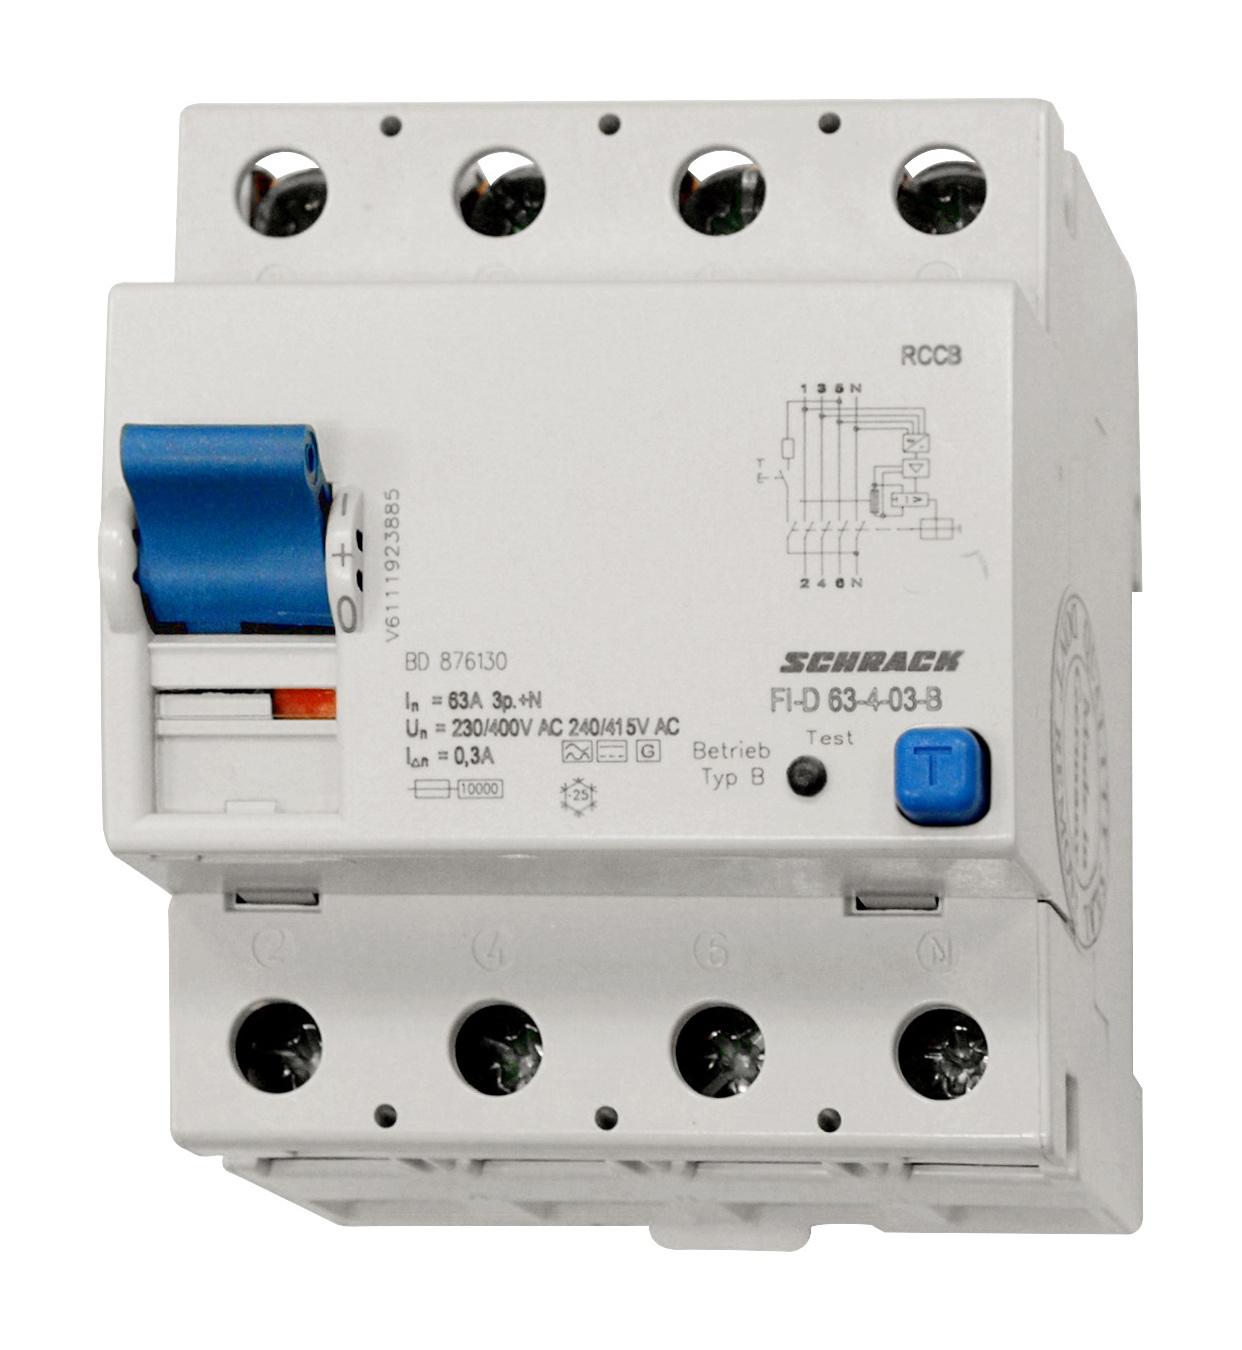 1 Stk Allstromsensitiver FI-Schalter 63A, 4-polig, 300mA, Typ B BD876130--